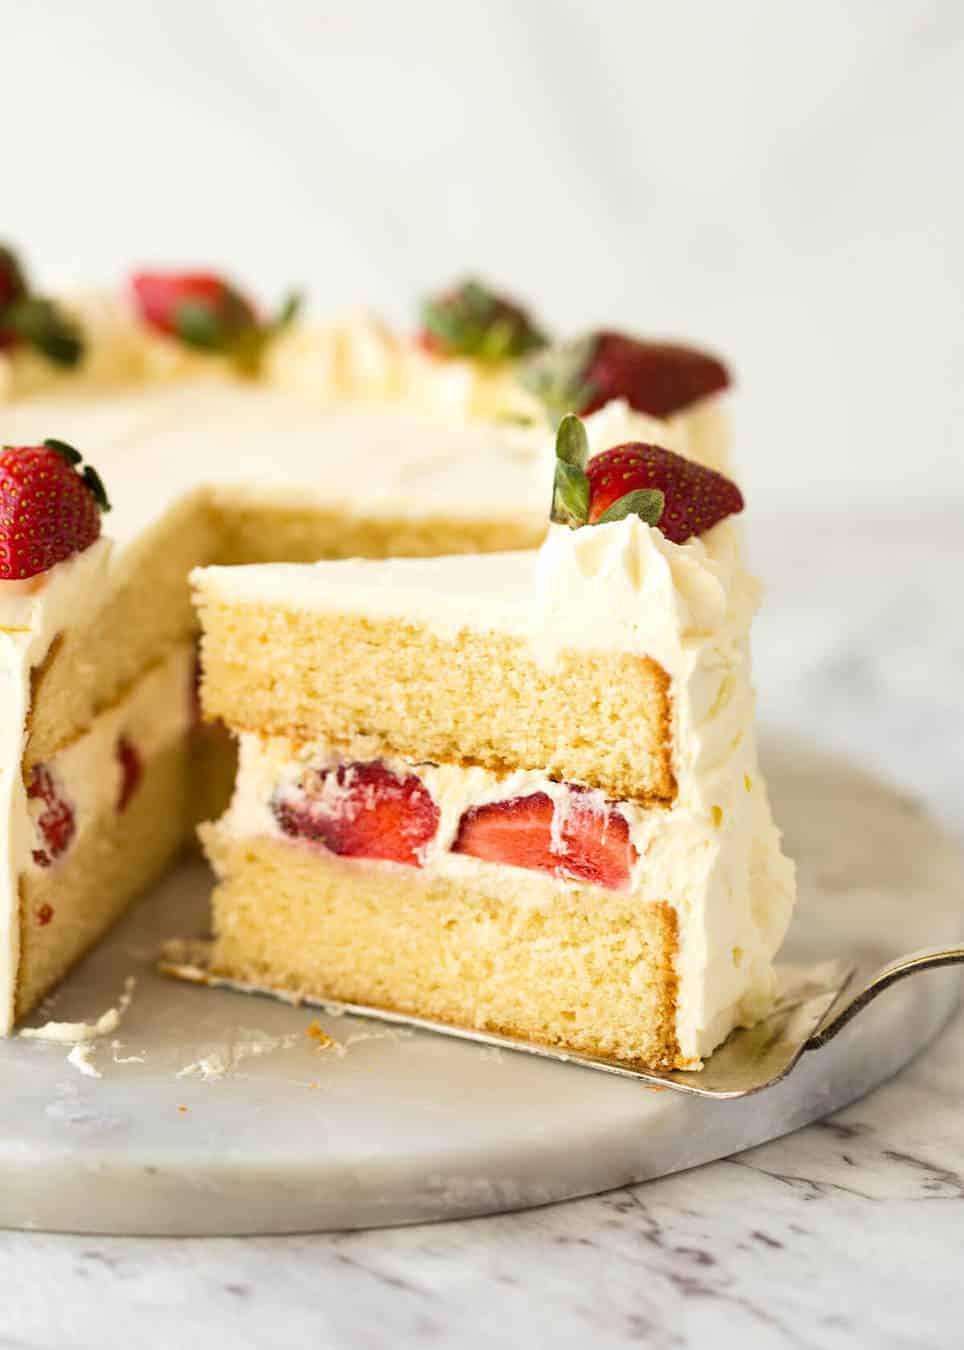 Sponge Cake Recipe  Vanilla Sponge Cake